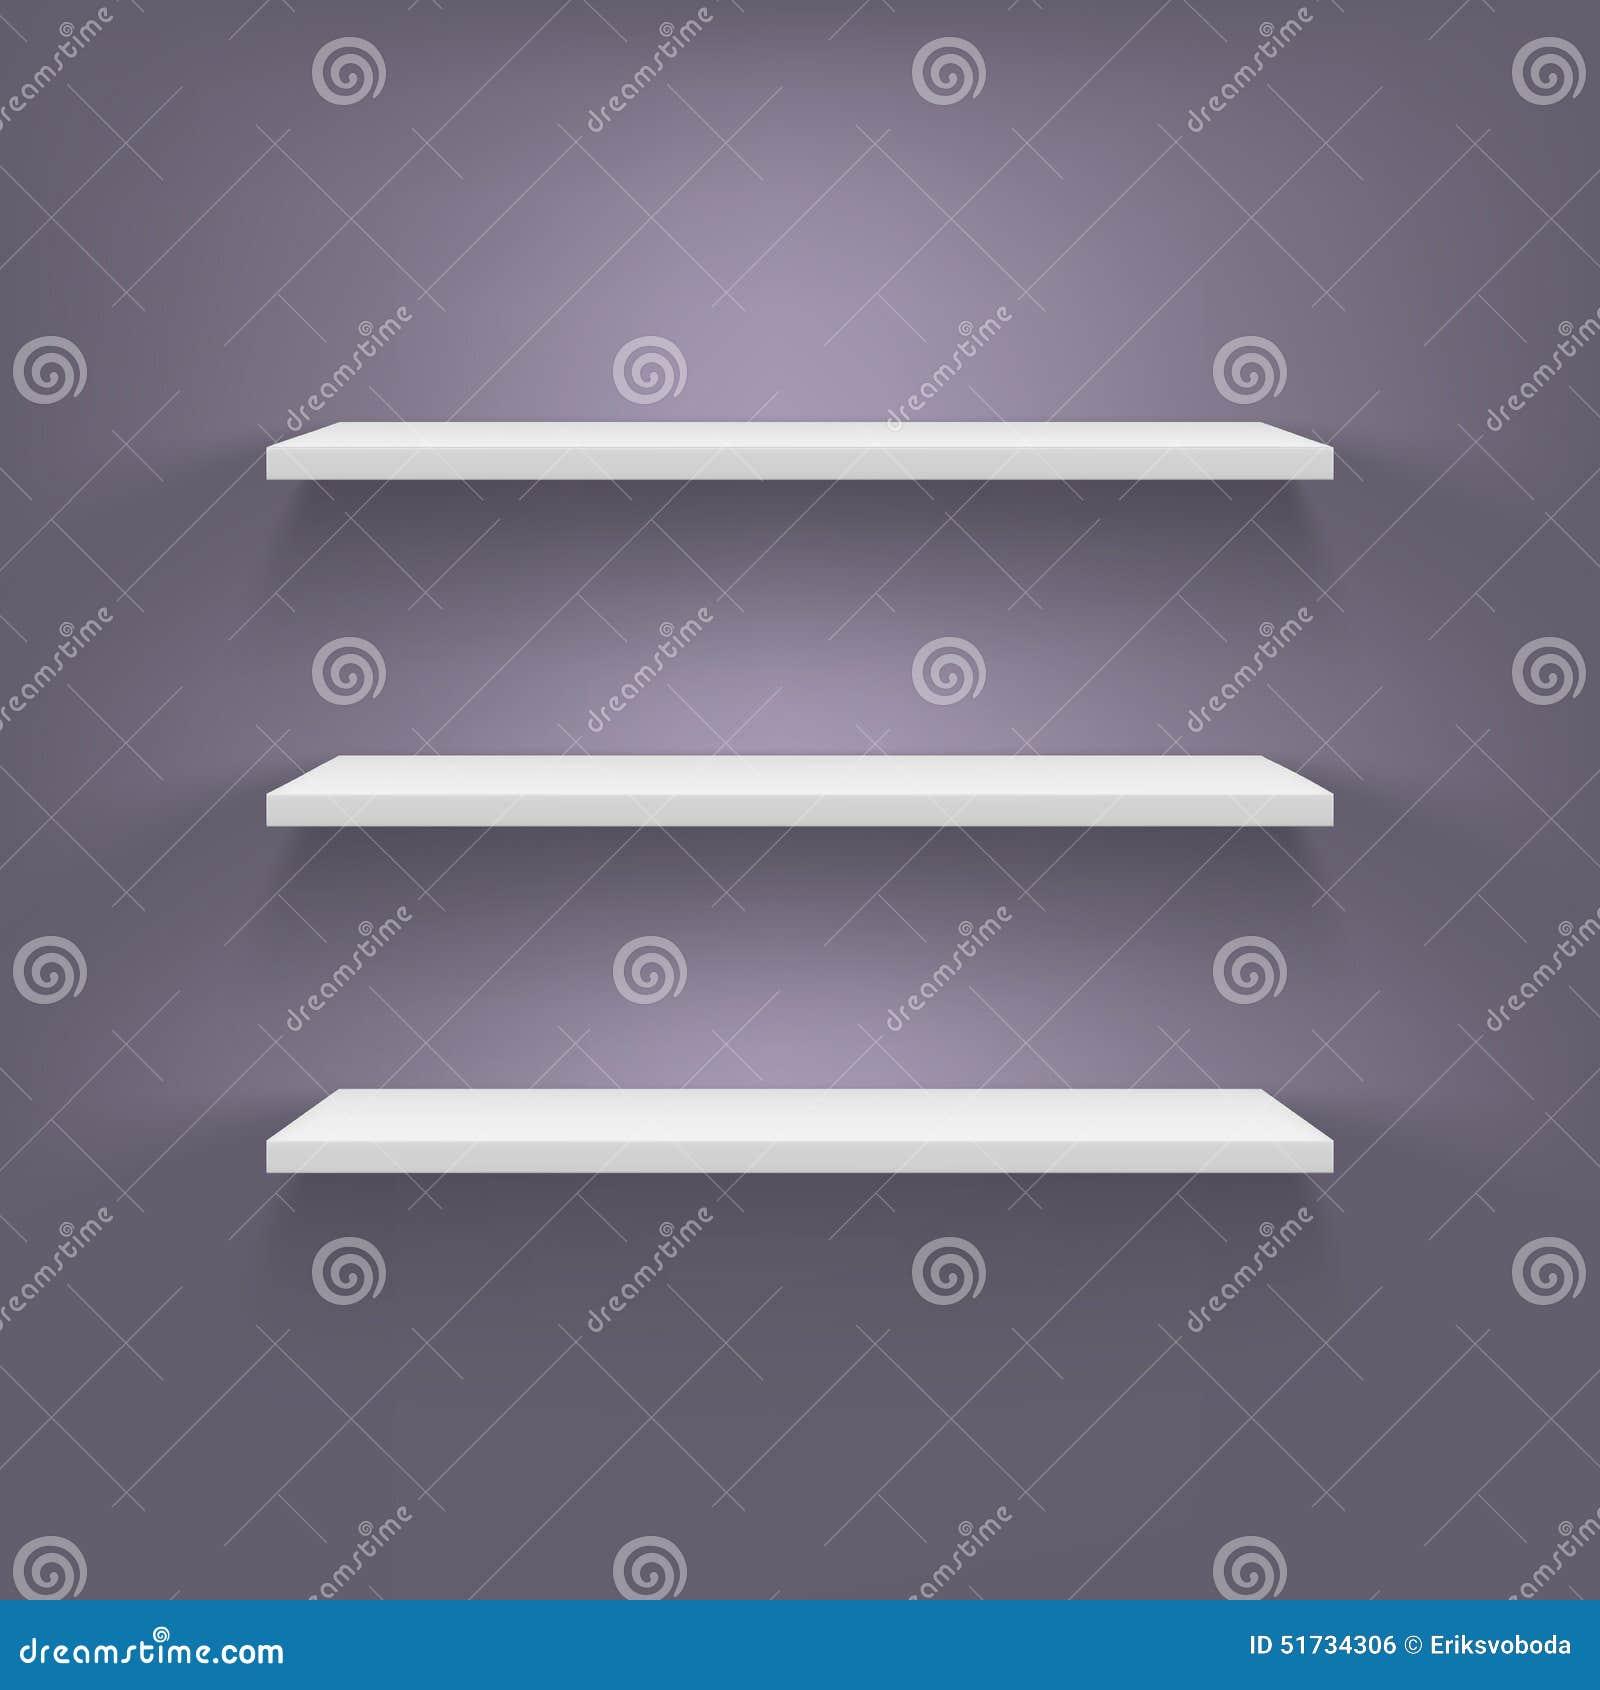 befestigung wand cheap versteckte schicht bord regal halterung mbel an der wand befestigt with. Black Bedroom Furniture Sets. Home Design Ideas